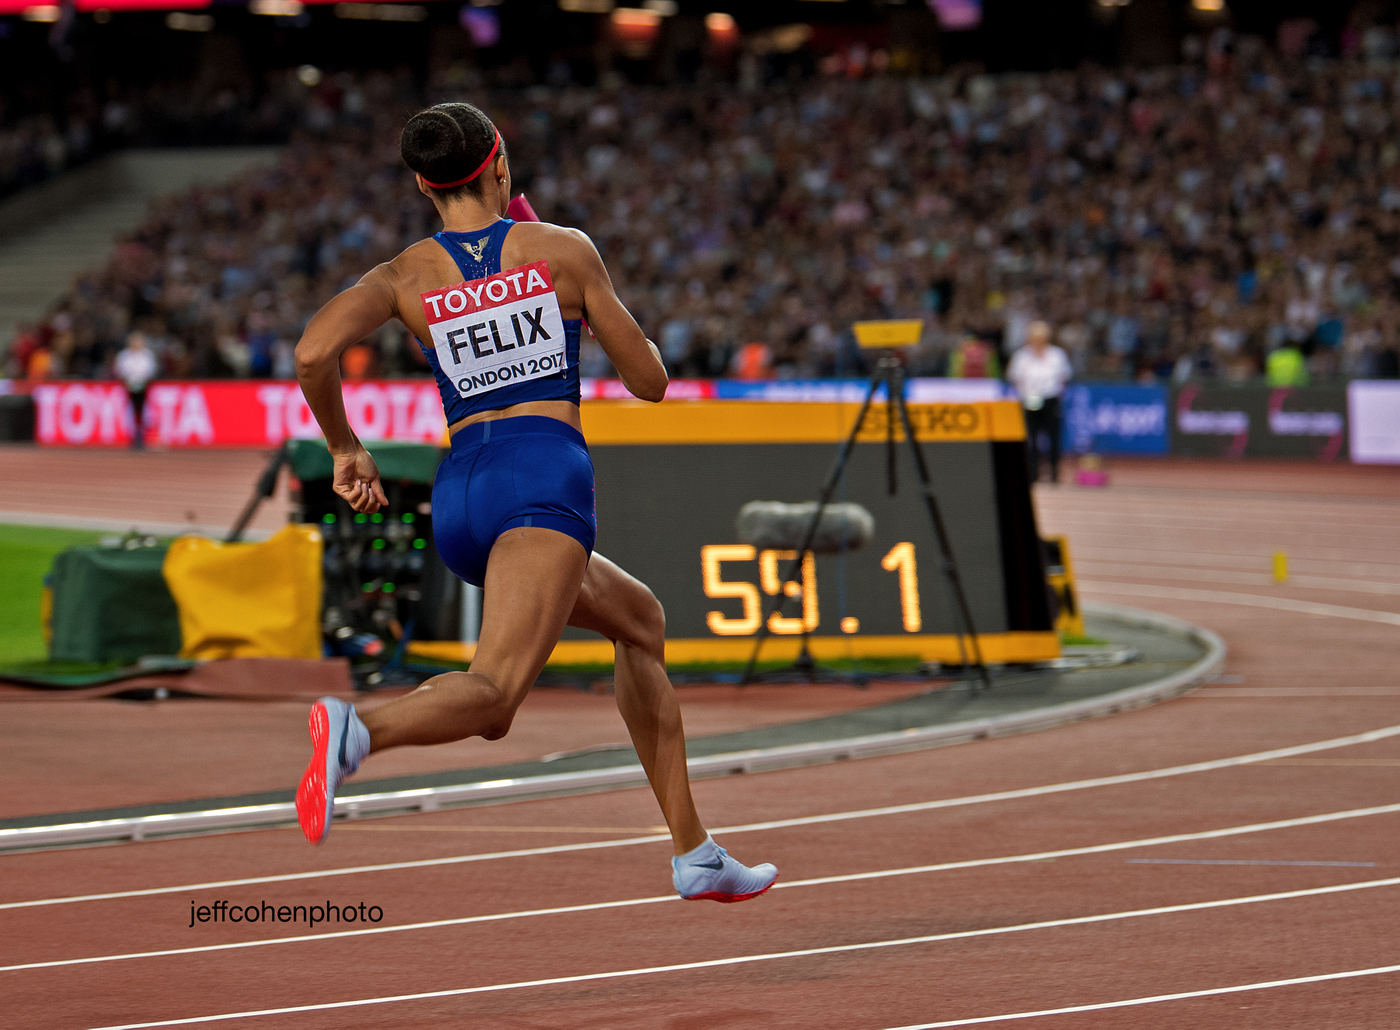 2017-IAAF-WC-London-night10--felix-4x400-1962--jeff-cohen-photo--web.jpg